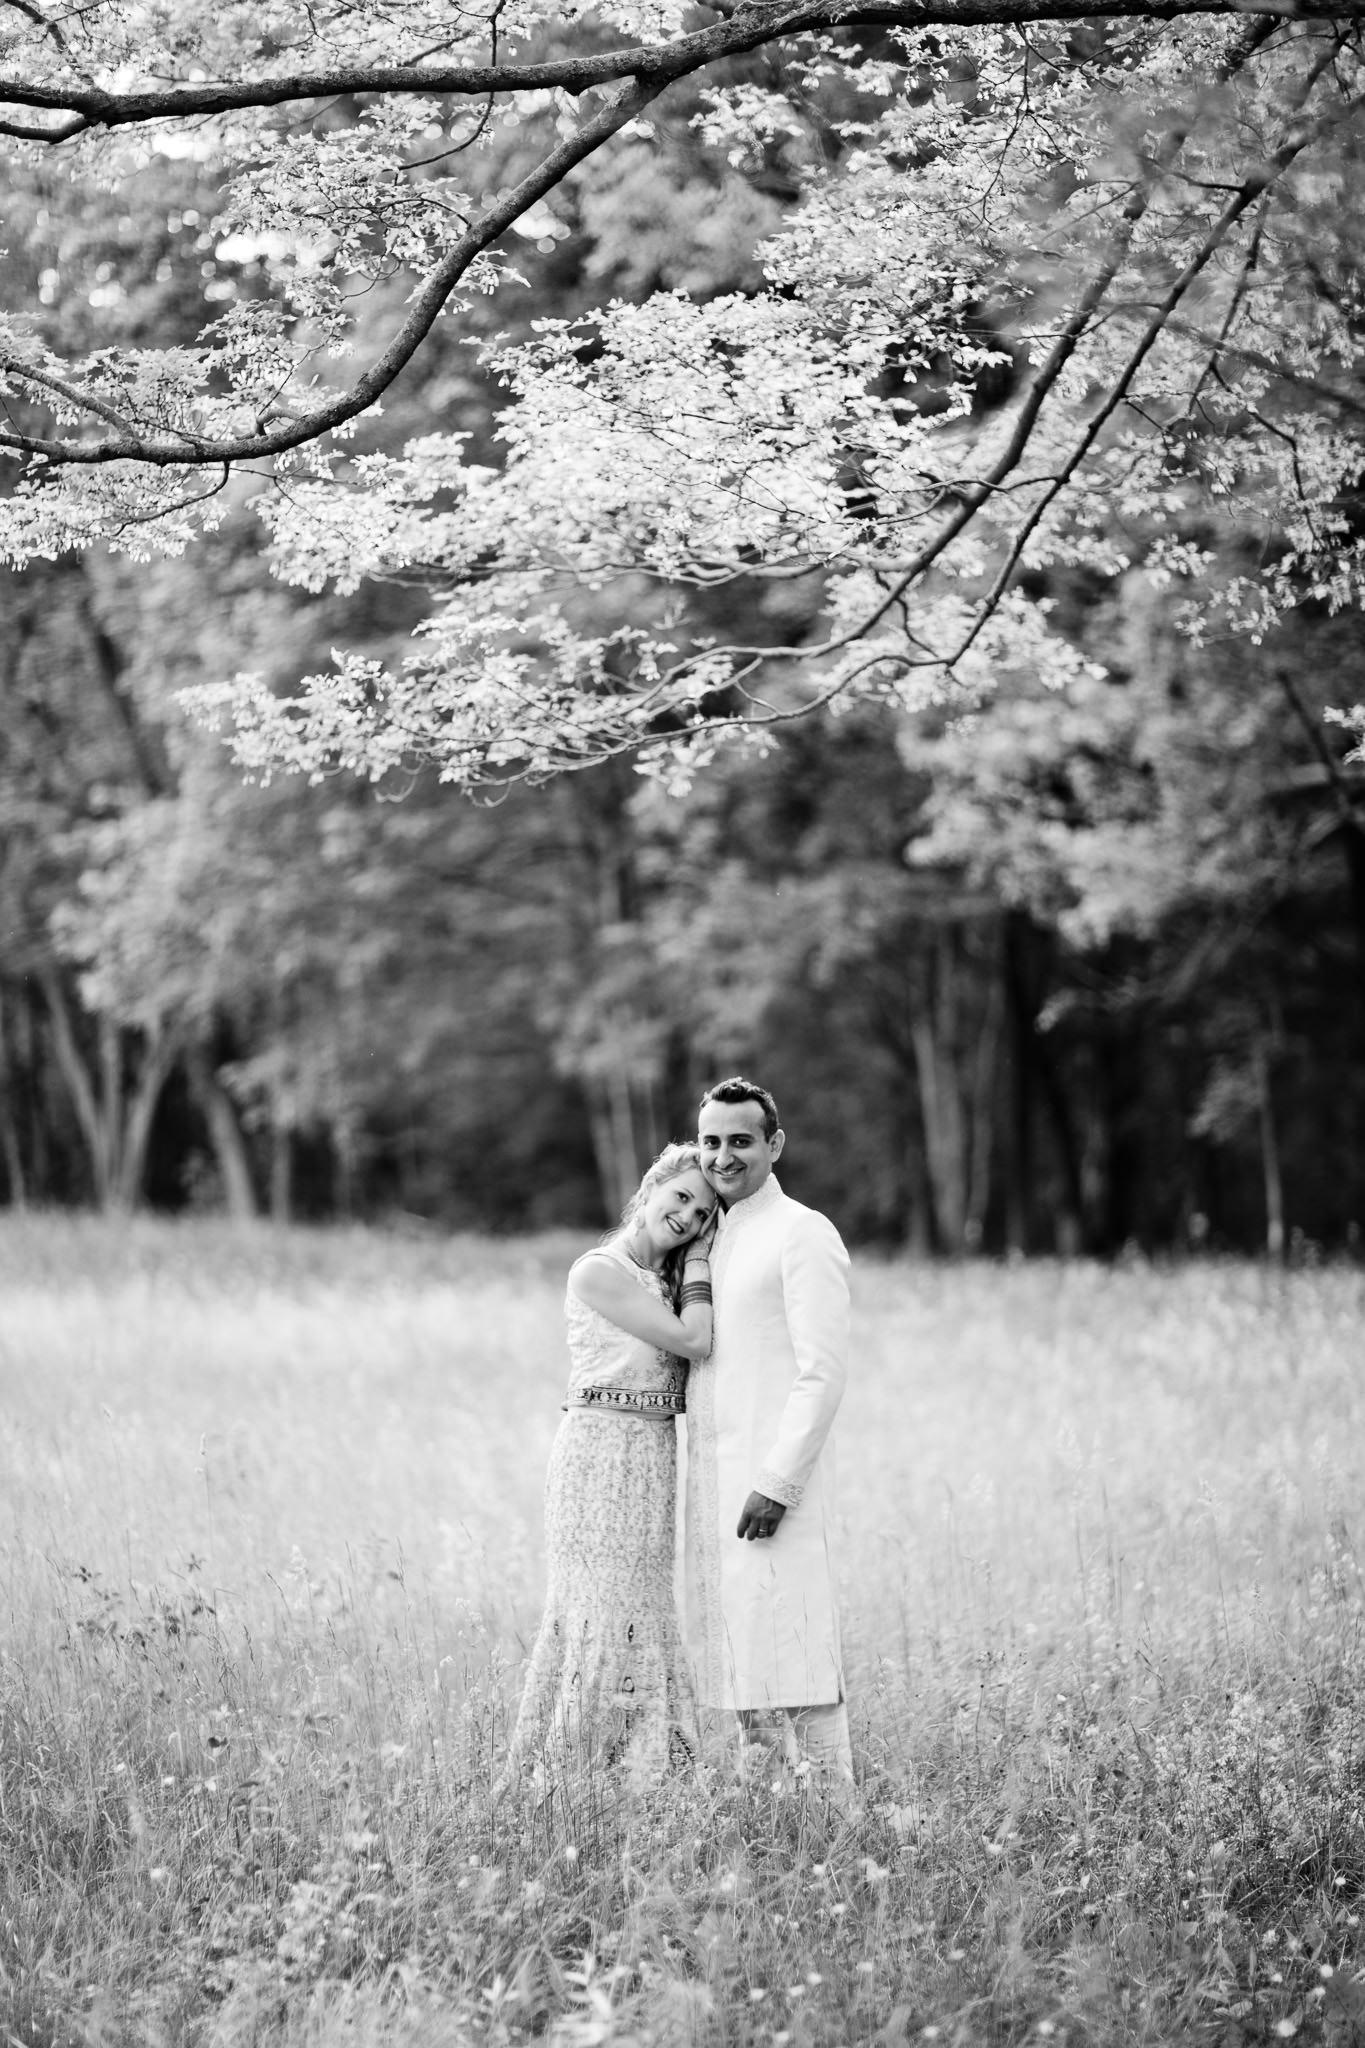 039_Canada-documentary-wedding-photograp